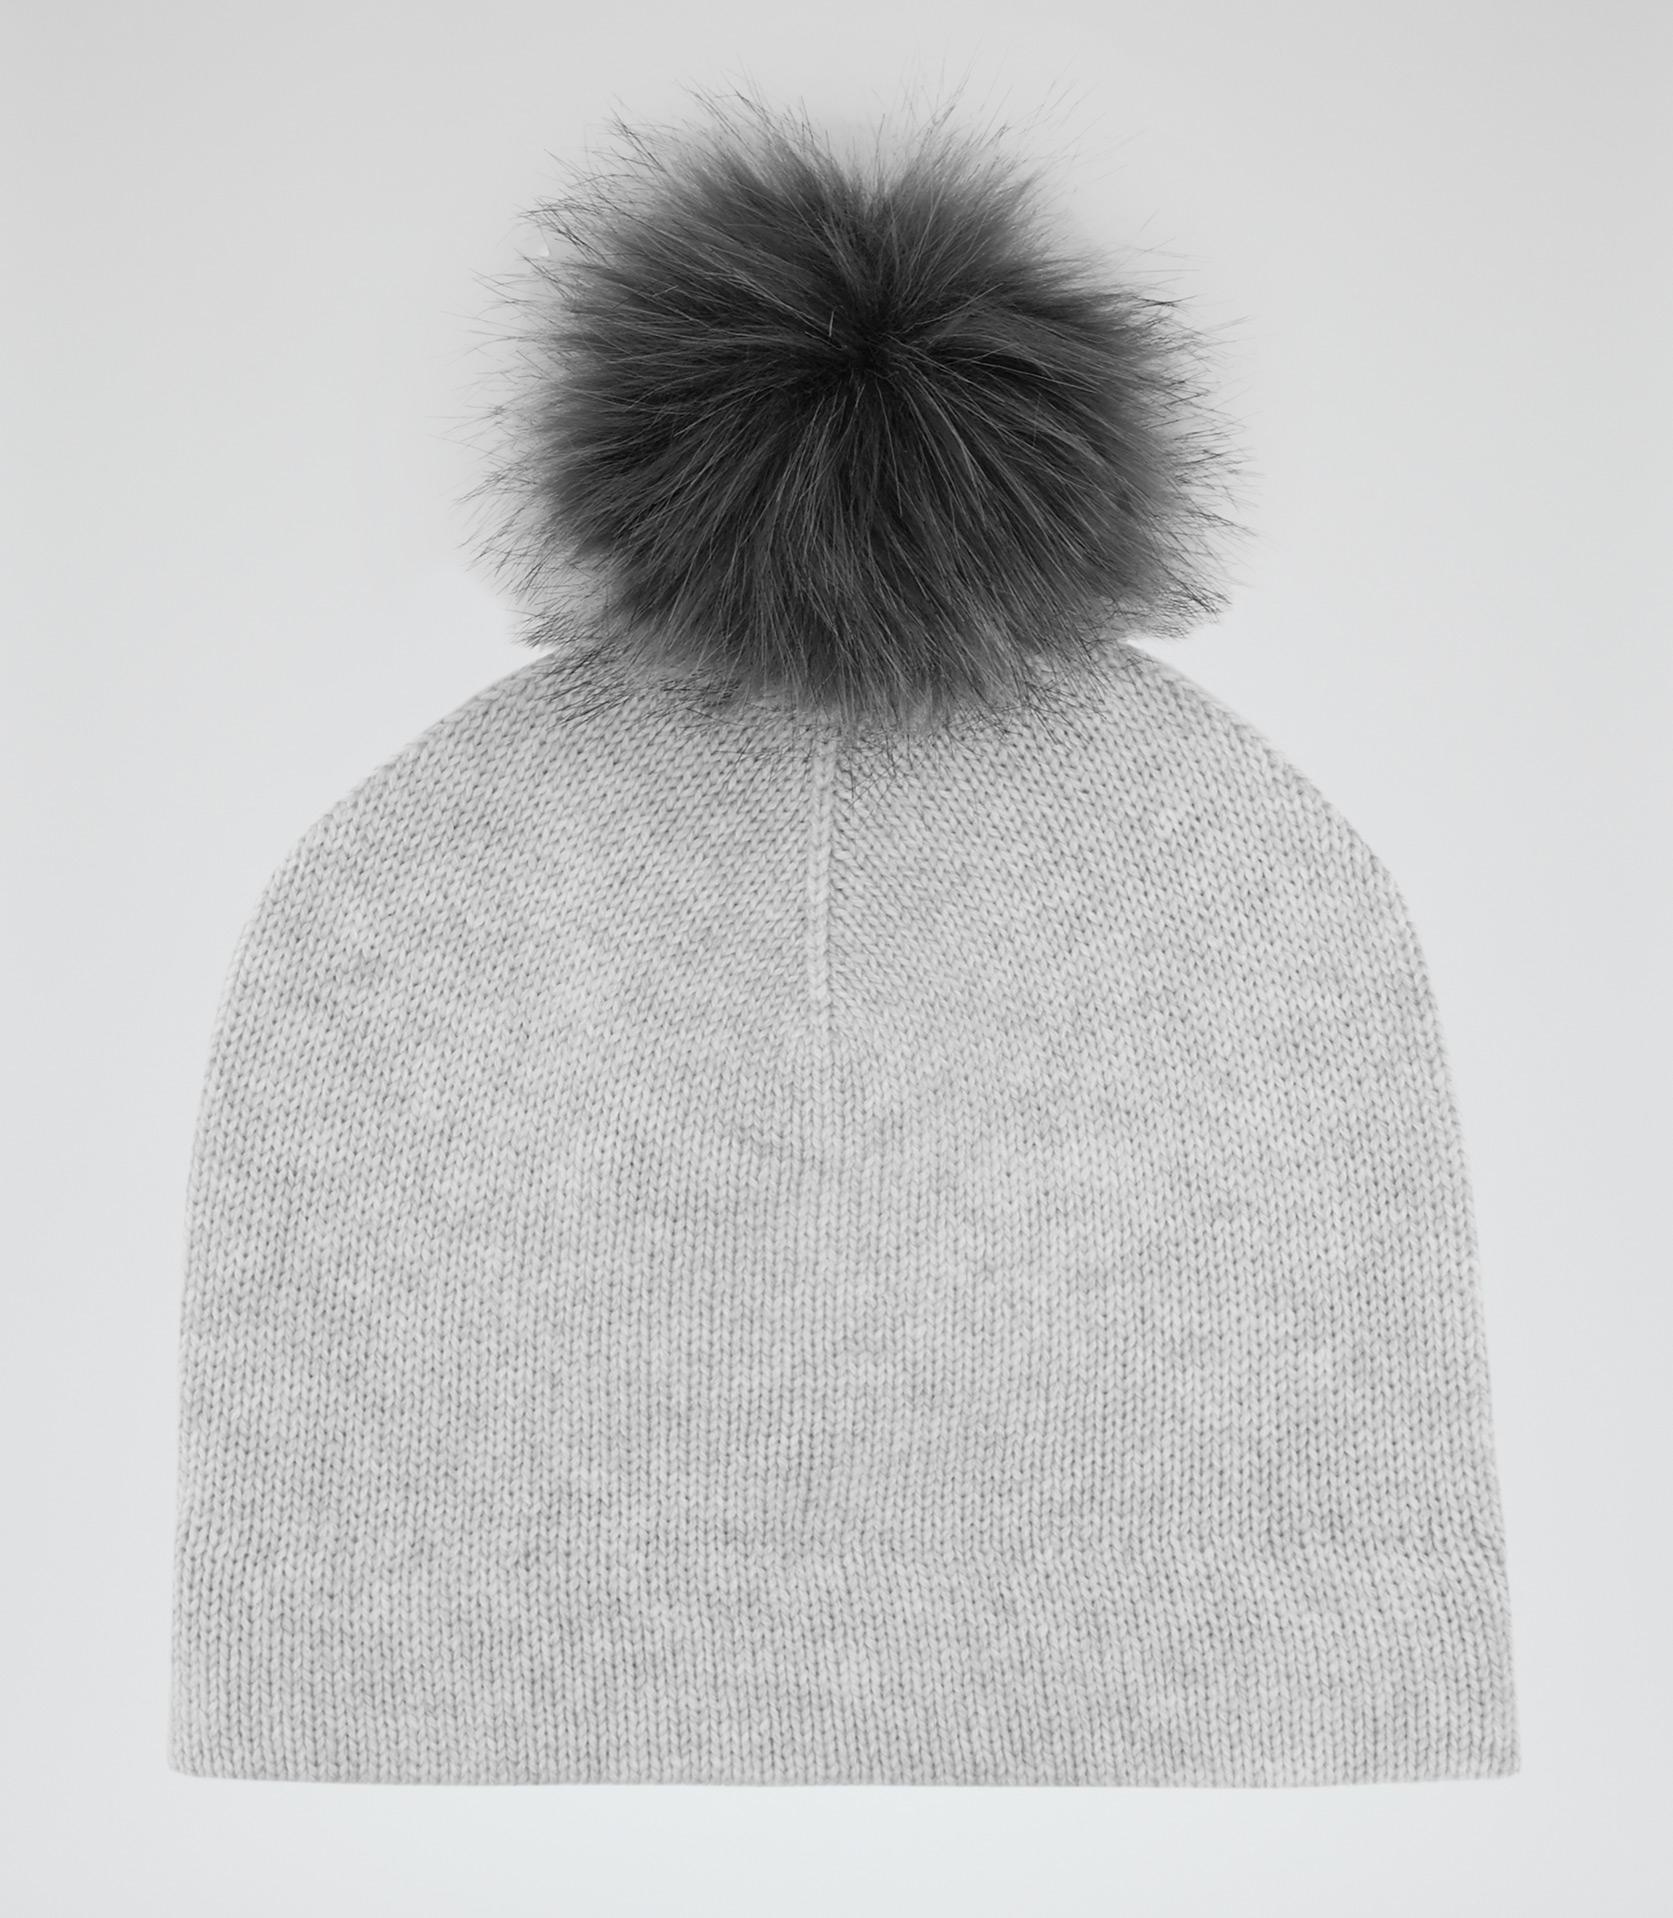 4f6d7fcf774 Lyst - Reiss Flo Cashmere-blend Bobble Hat in Gray